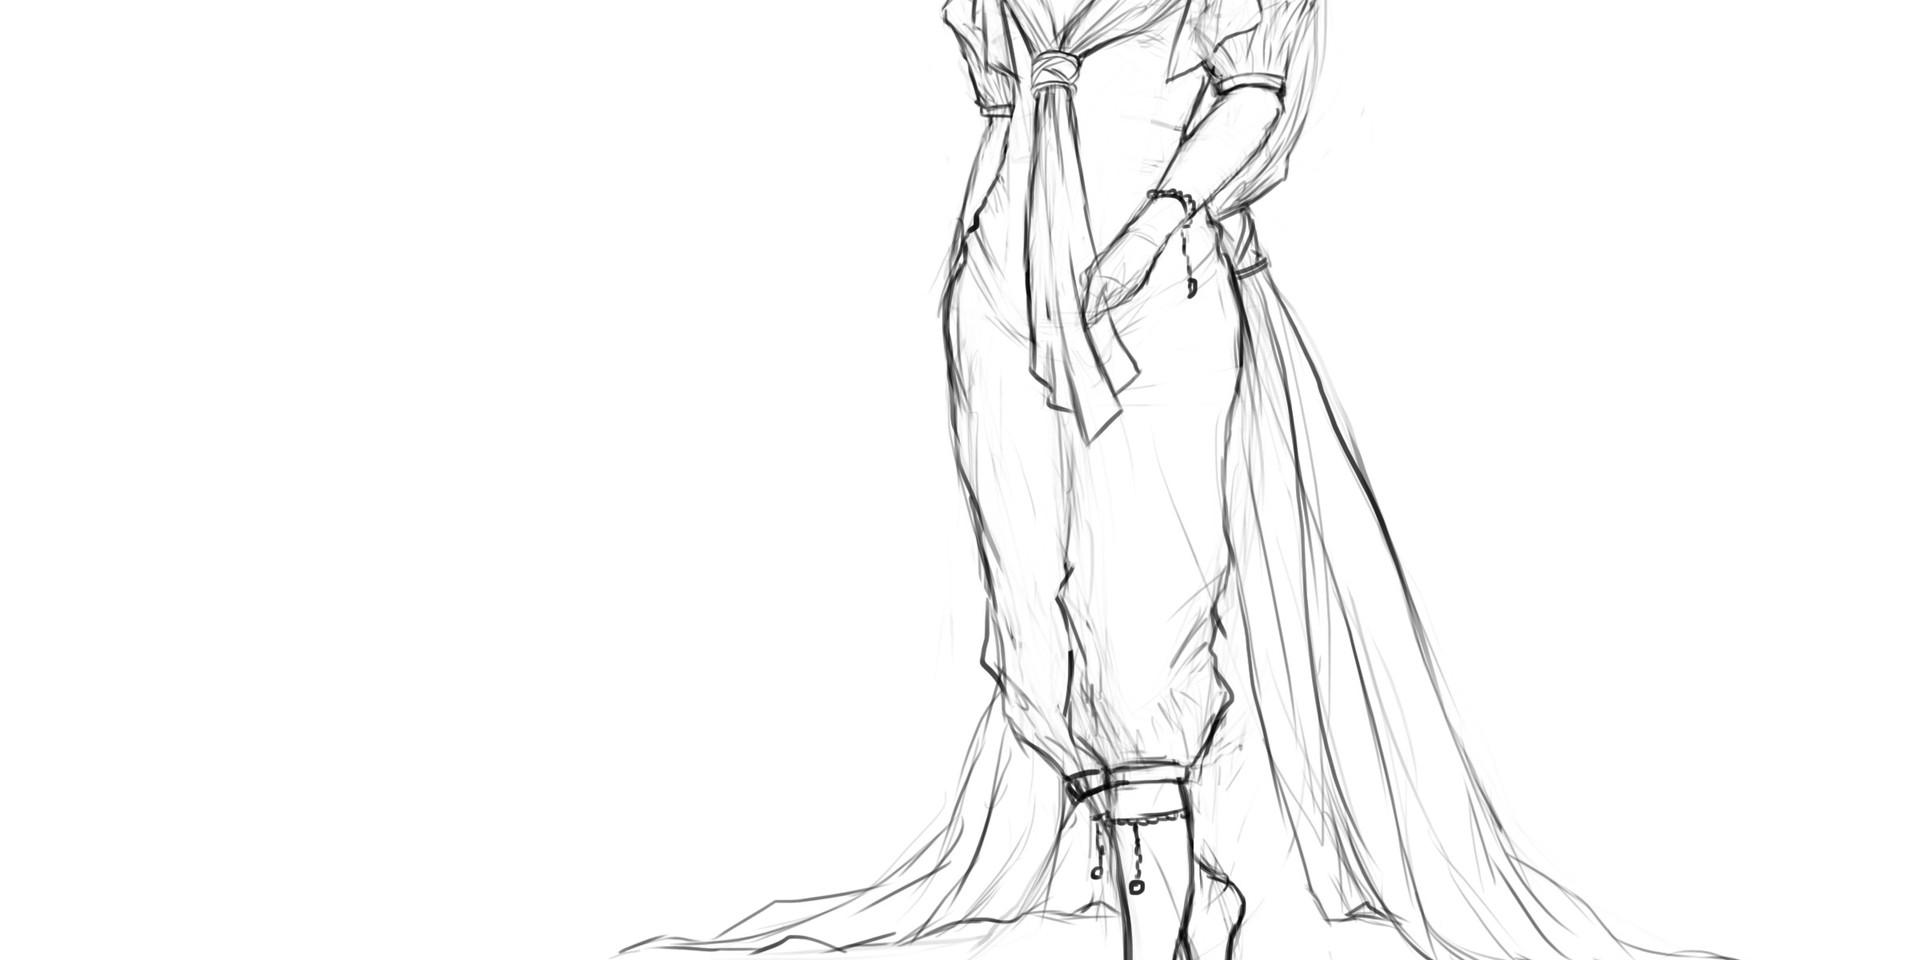 Mica_Wedding dress_sketch.jpg